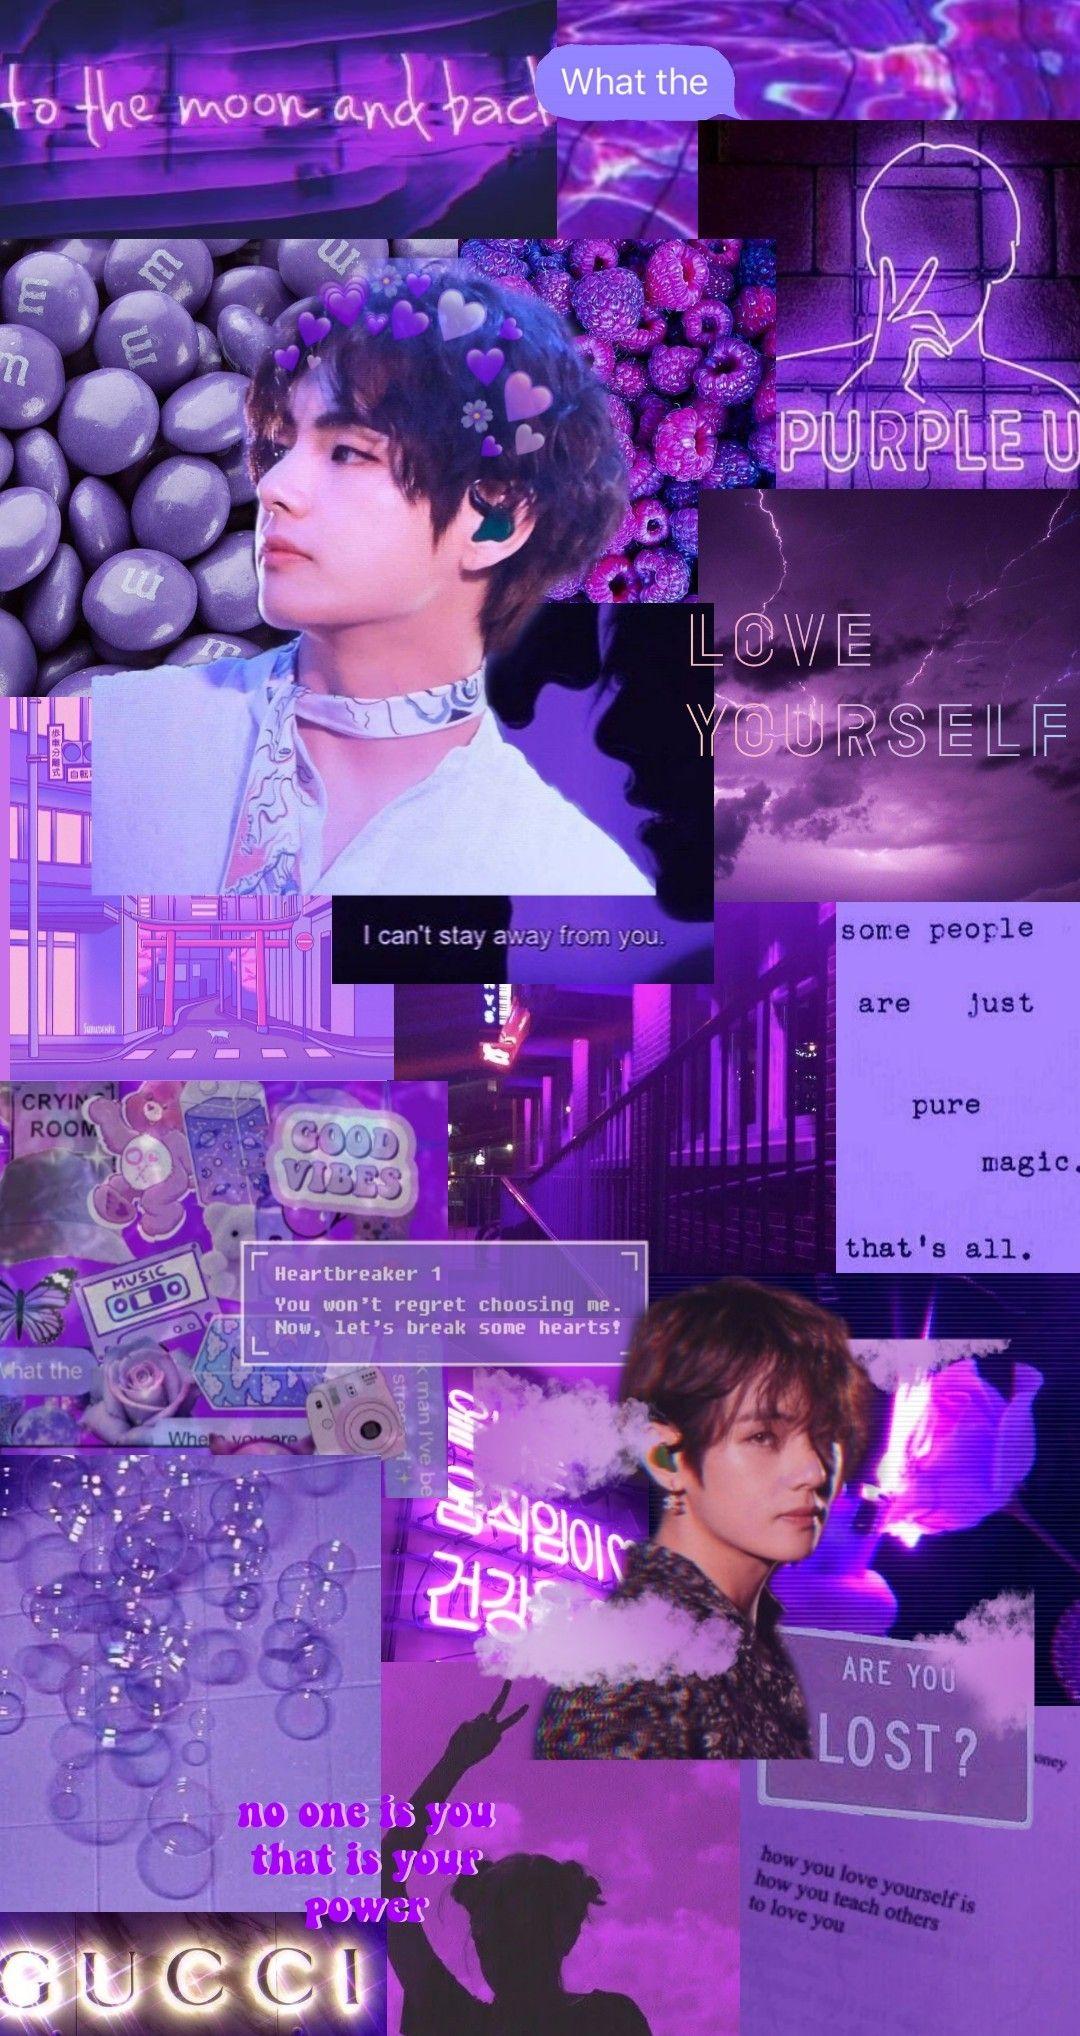 V Purple Aesthetic In 2021 Bts Walpaper Bts Taehyung Bts Wallpaper Lyrics Bts taehyung aesthetic wallpaper